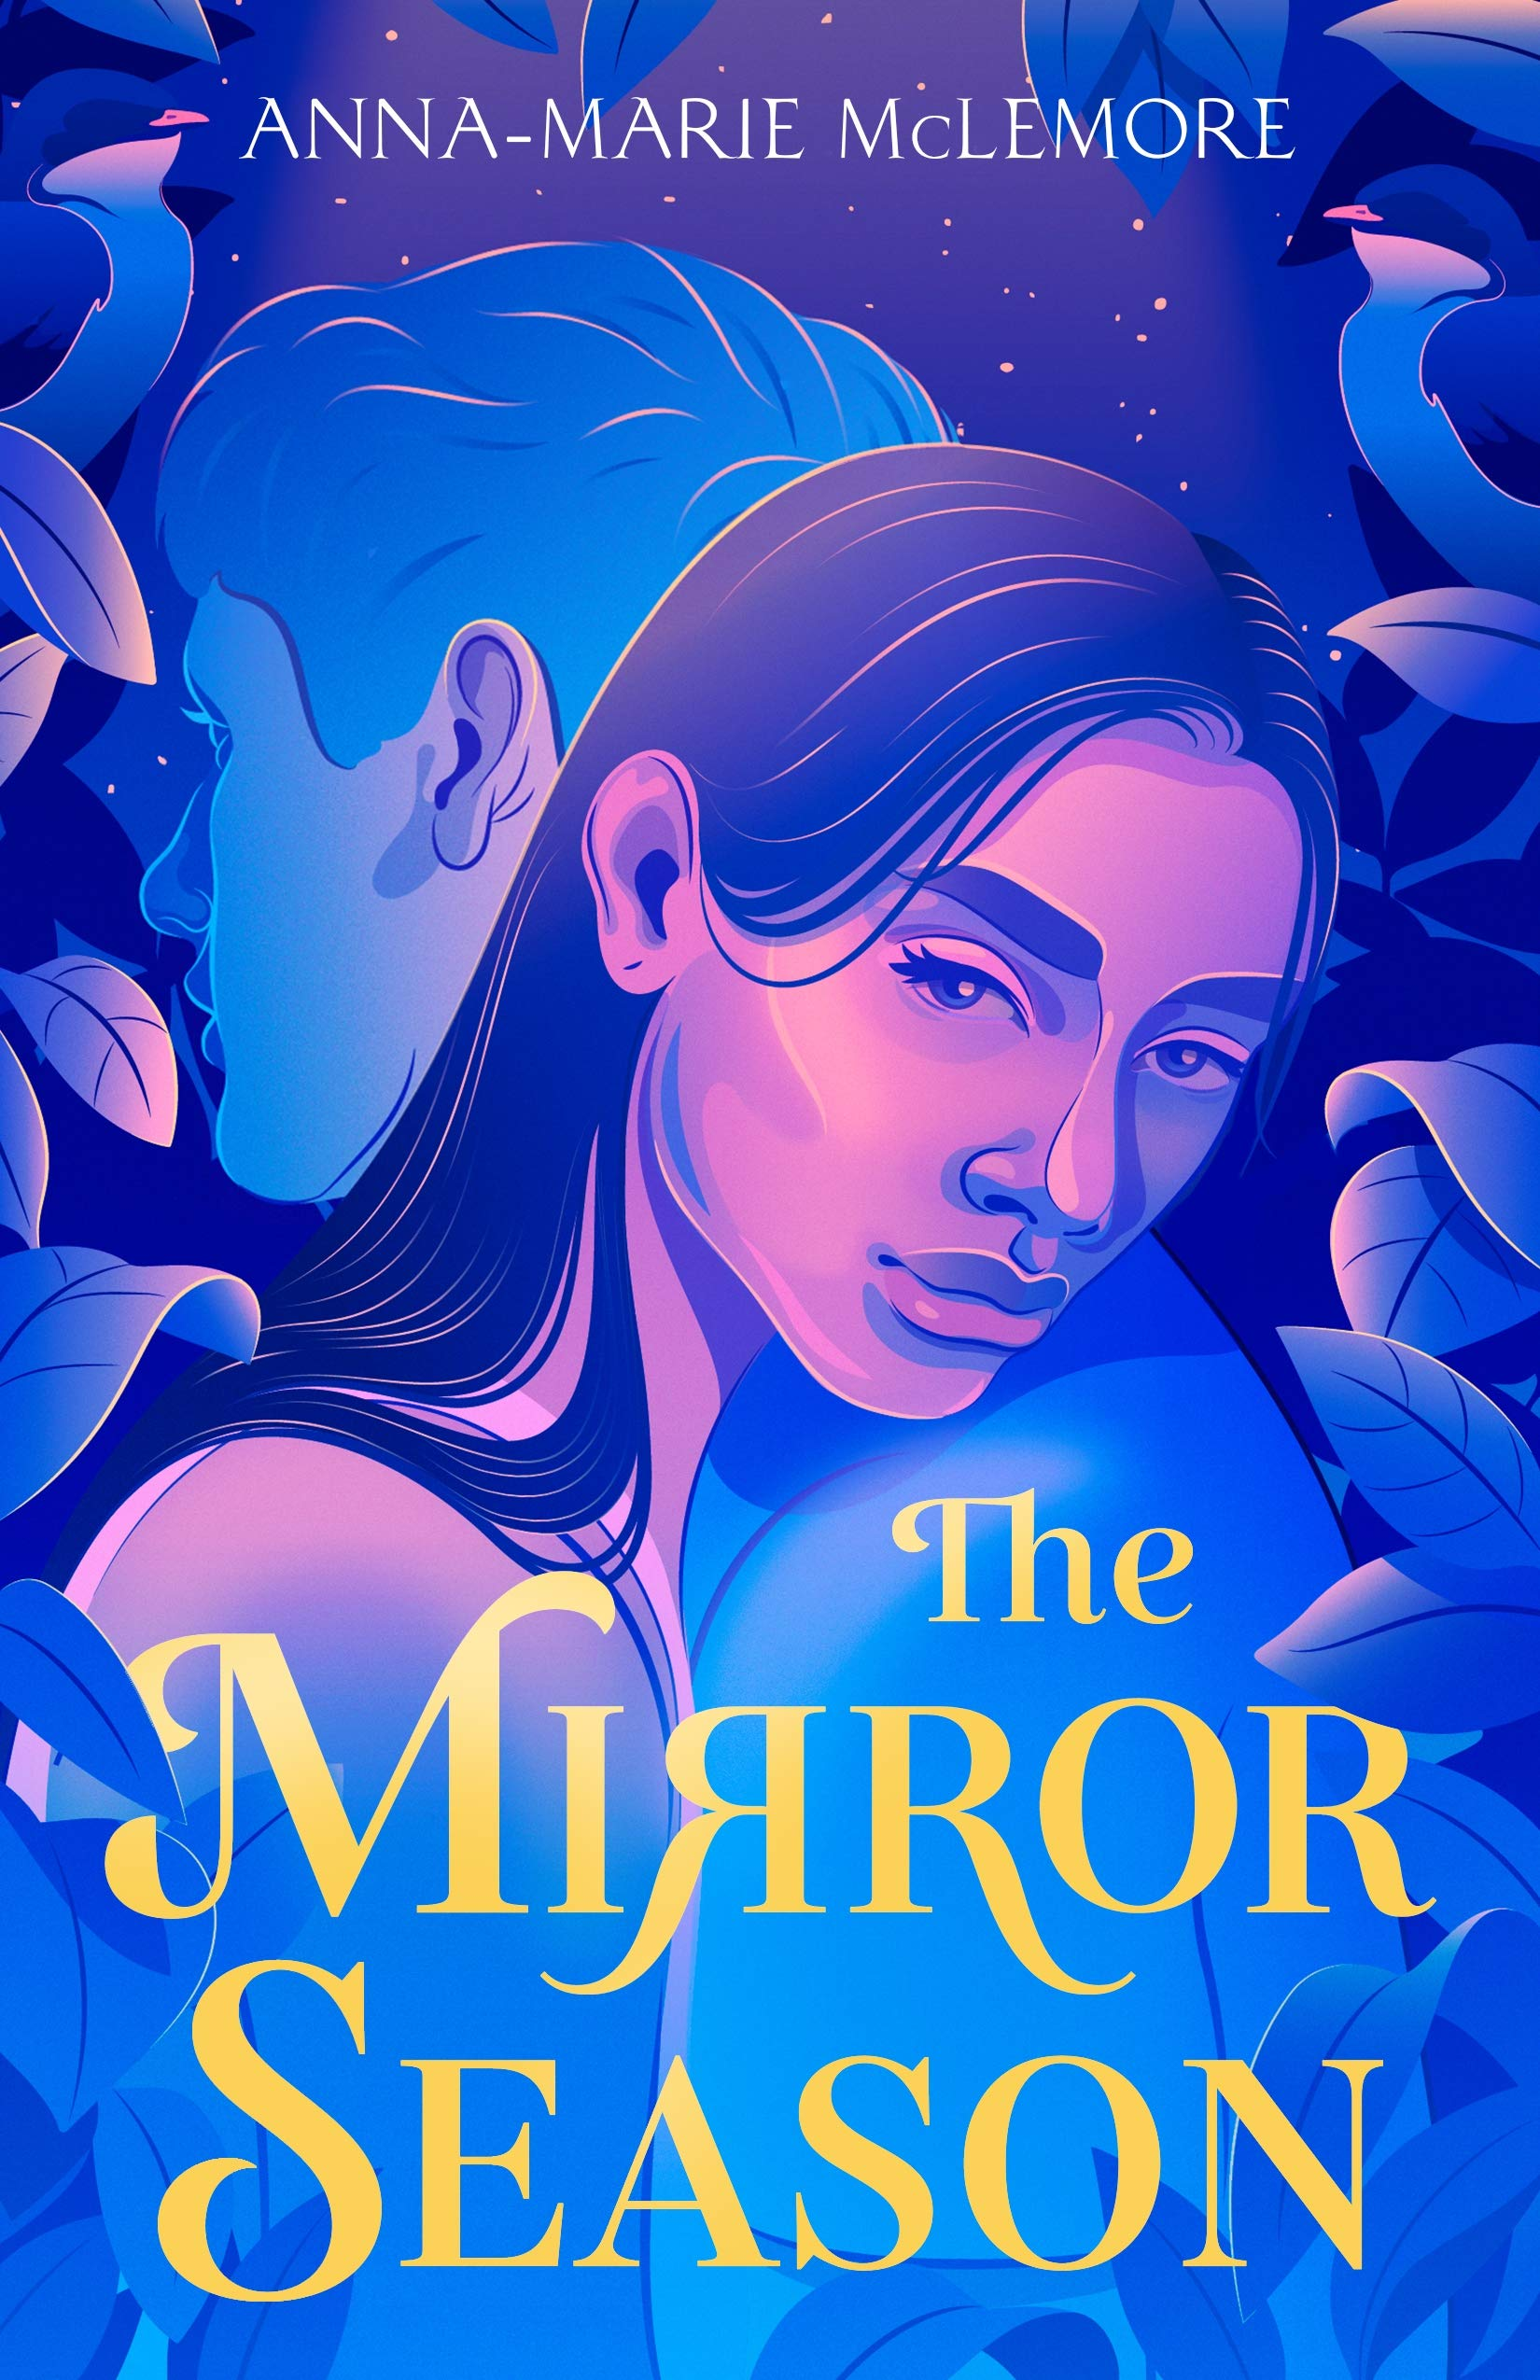 Amazon.com: The Mirror Season: 9781250624123: McLemore, Anna-Marie: Books